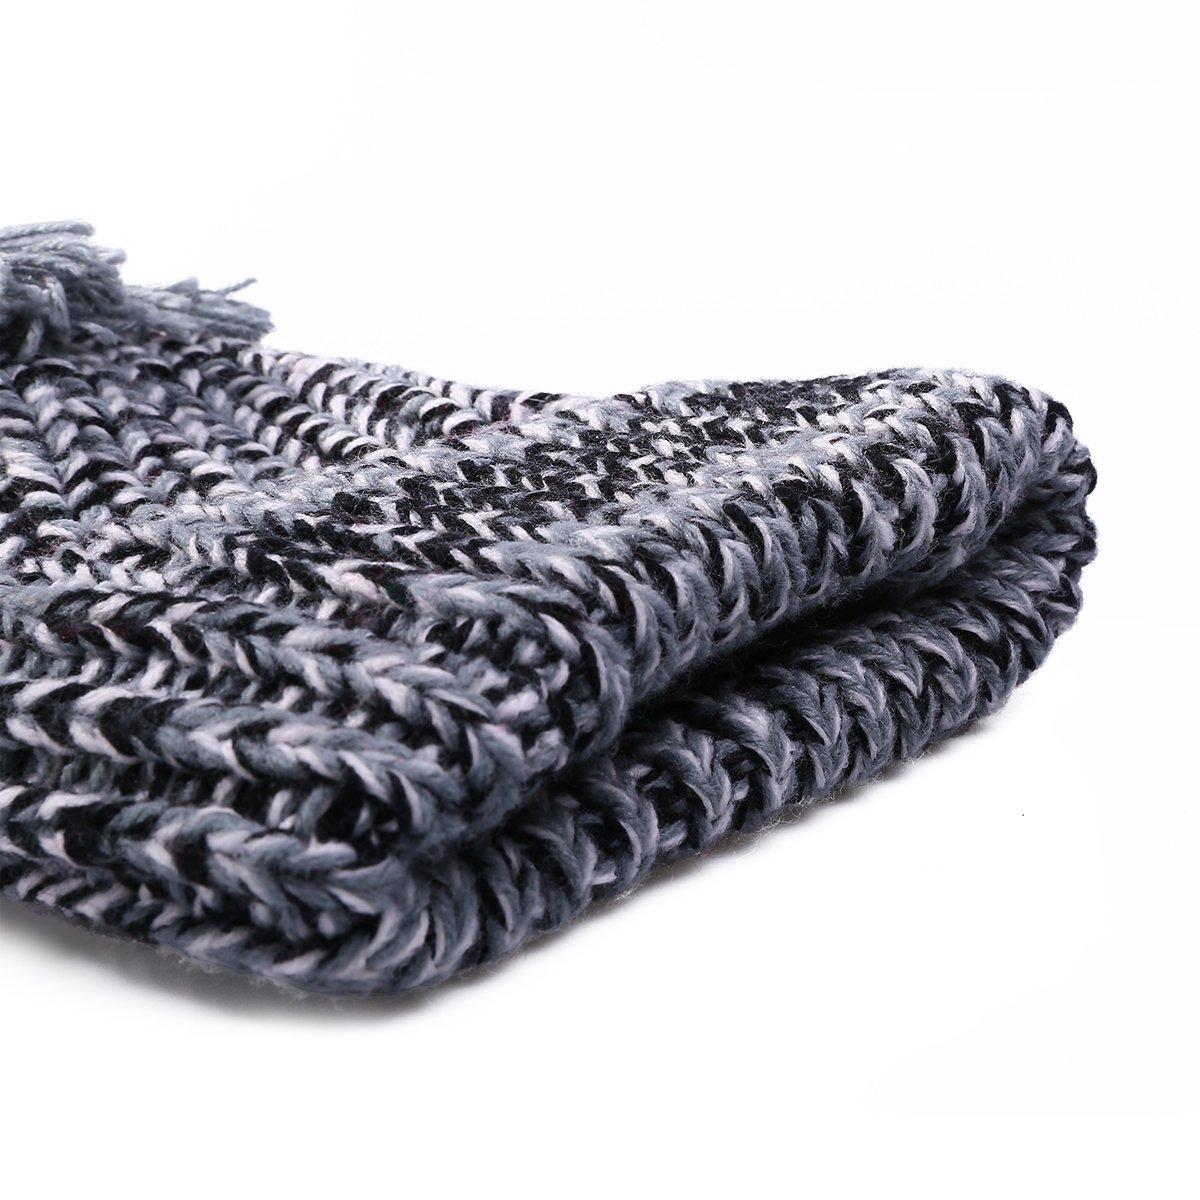 EVRFELAN Winter Women Slouchy Large Pompom Beanie Thick Warm Cable Knit Crochet Hat Fashion Stretchy Chunky Warm Ski Skull Cap Snowboard Braid Girls Solid Soft (Grey)